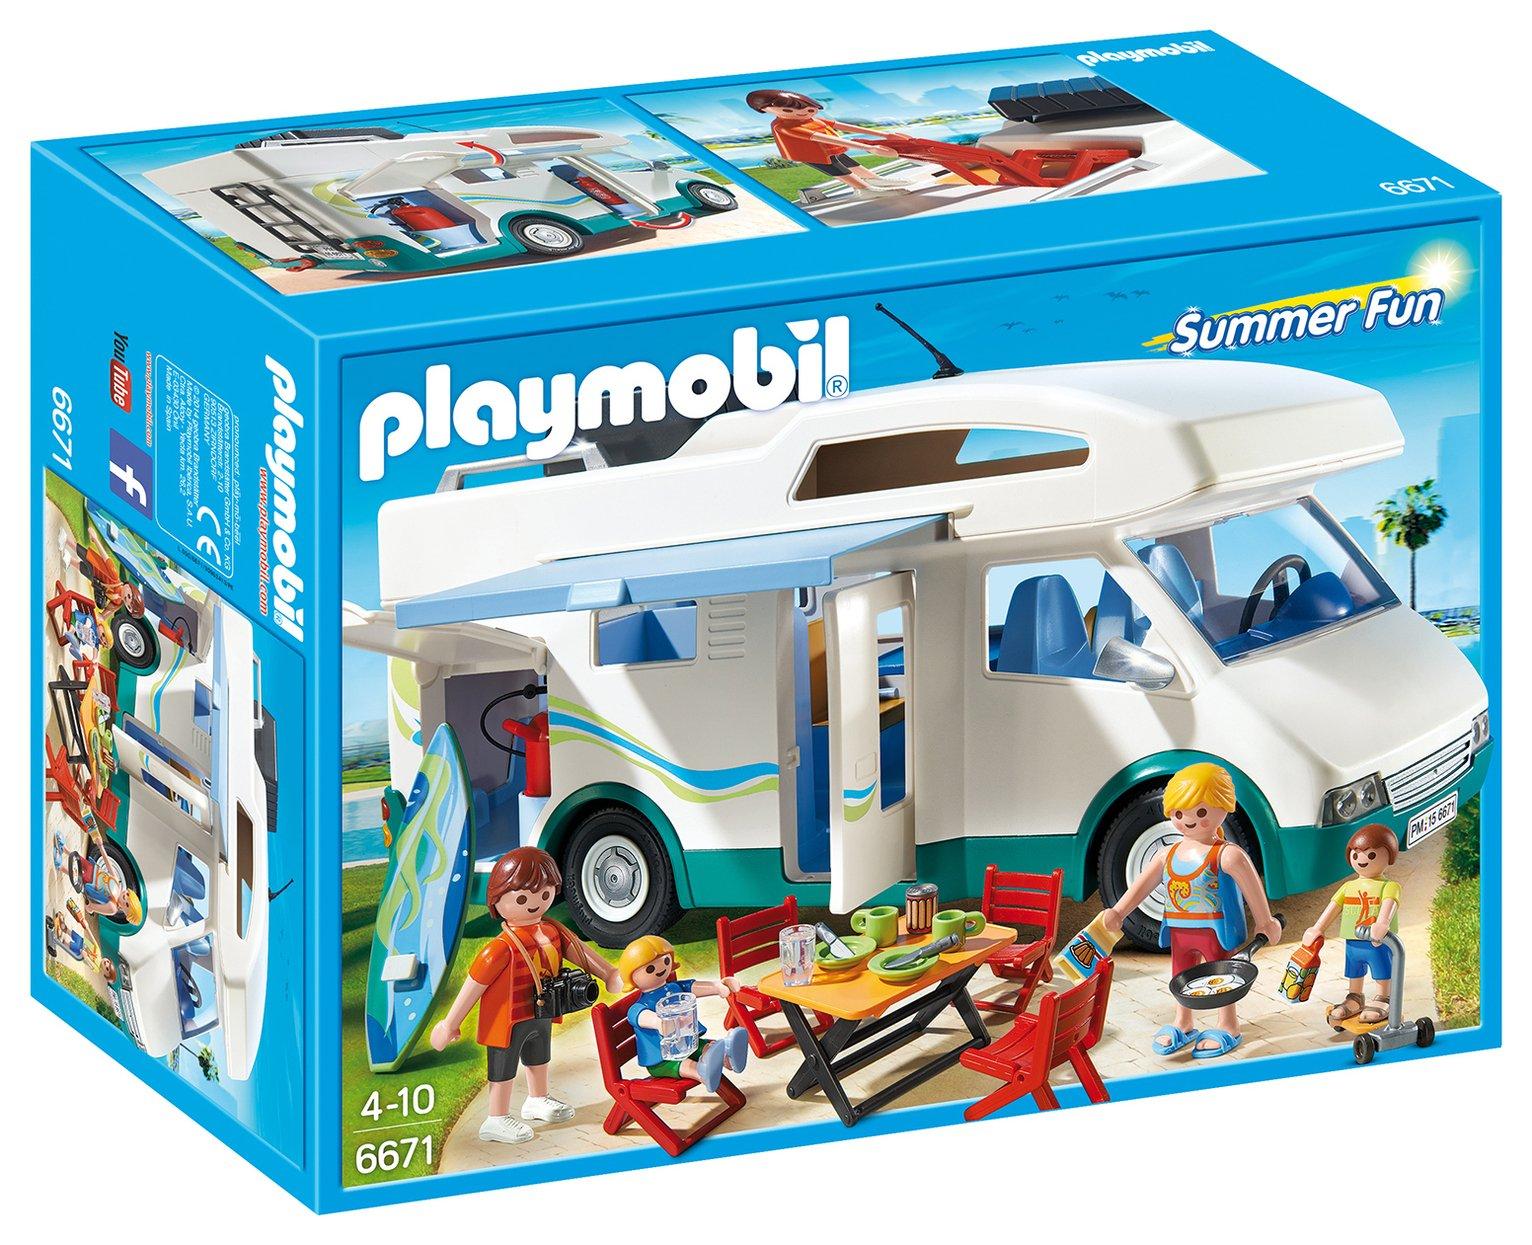 Playmobil 6671 Summer Camper Playset.